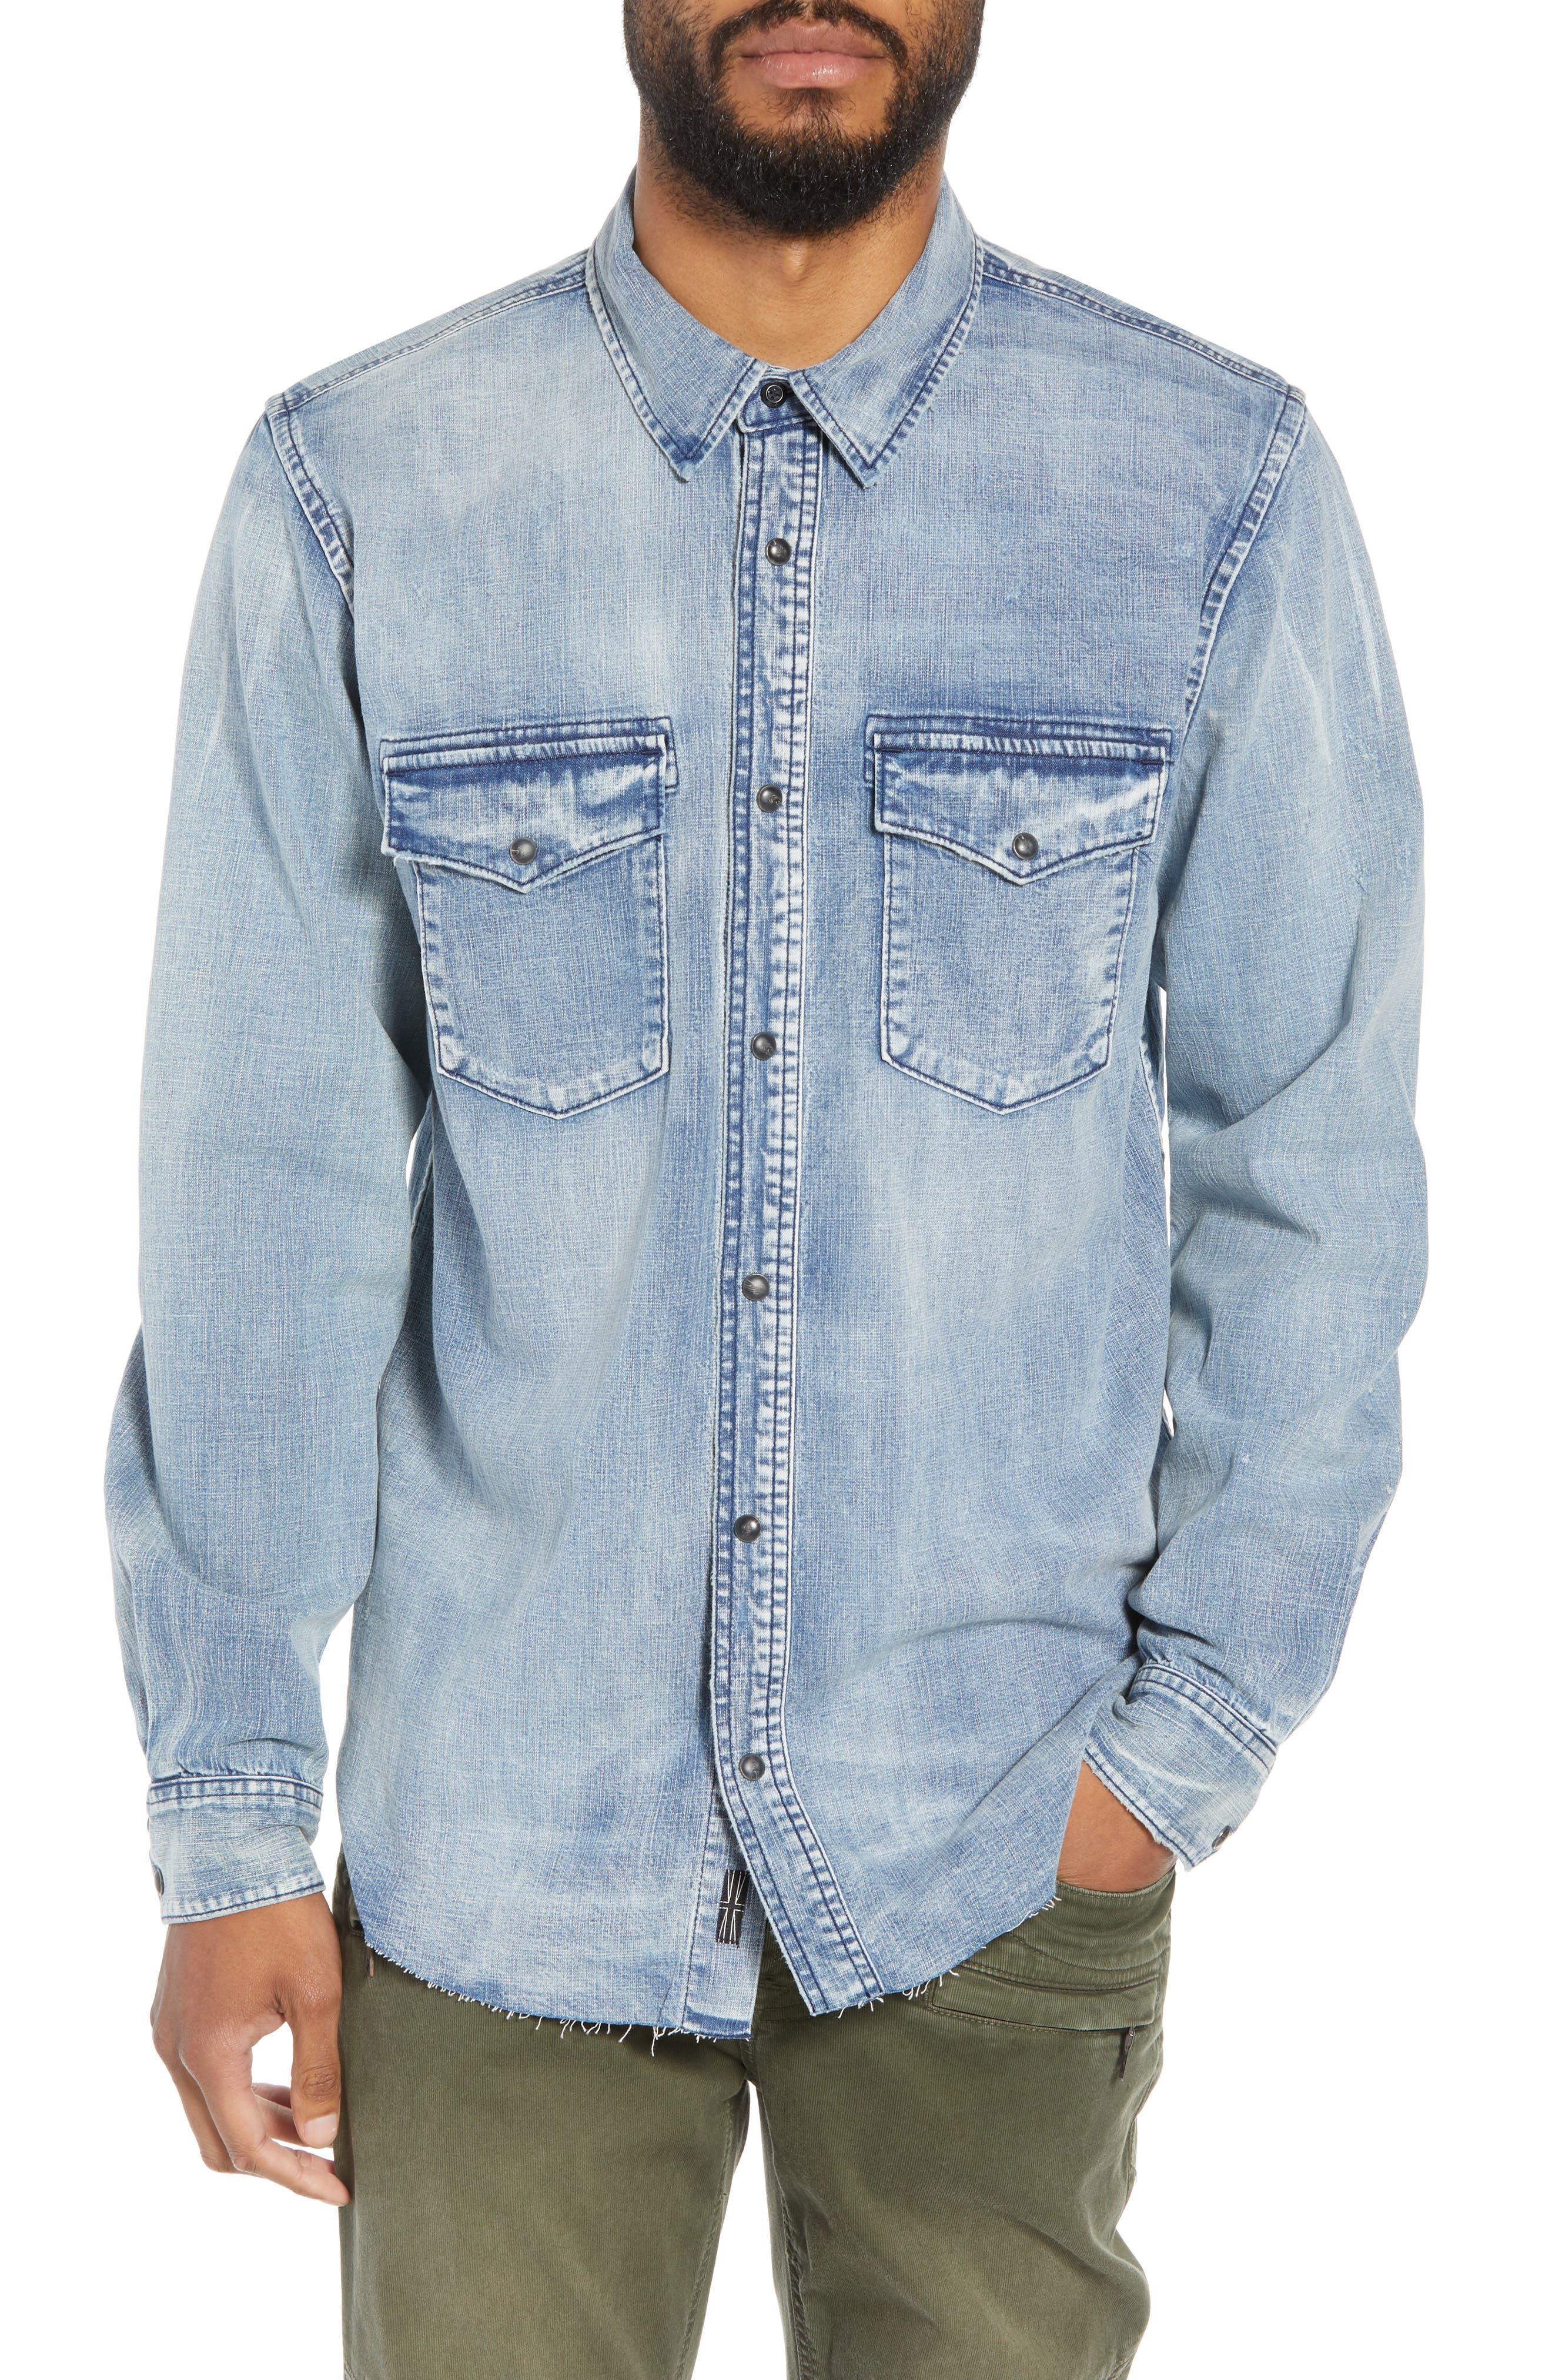 Hudson Regular Fit Denim Shirt,                             Main thumbnail 1, color,                             VINTAGE INDIGO